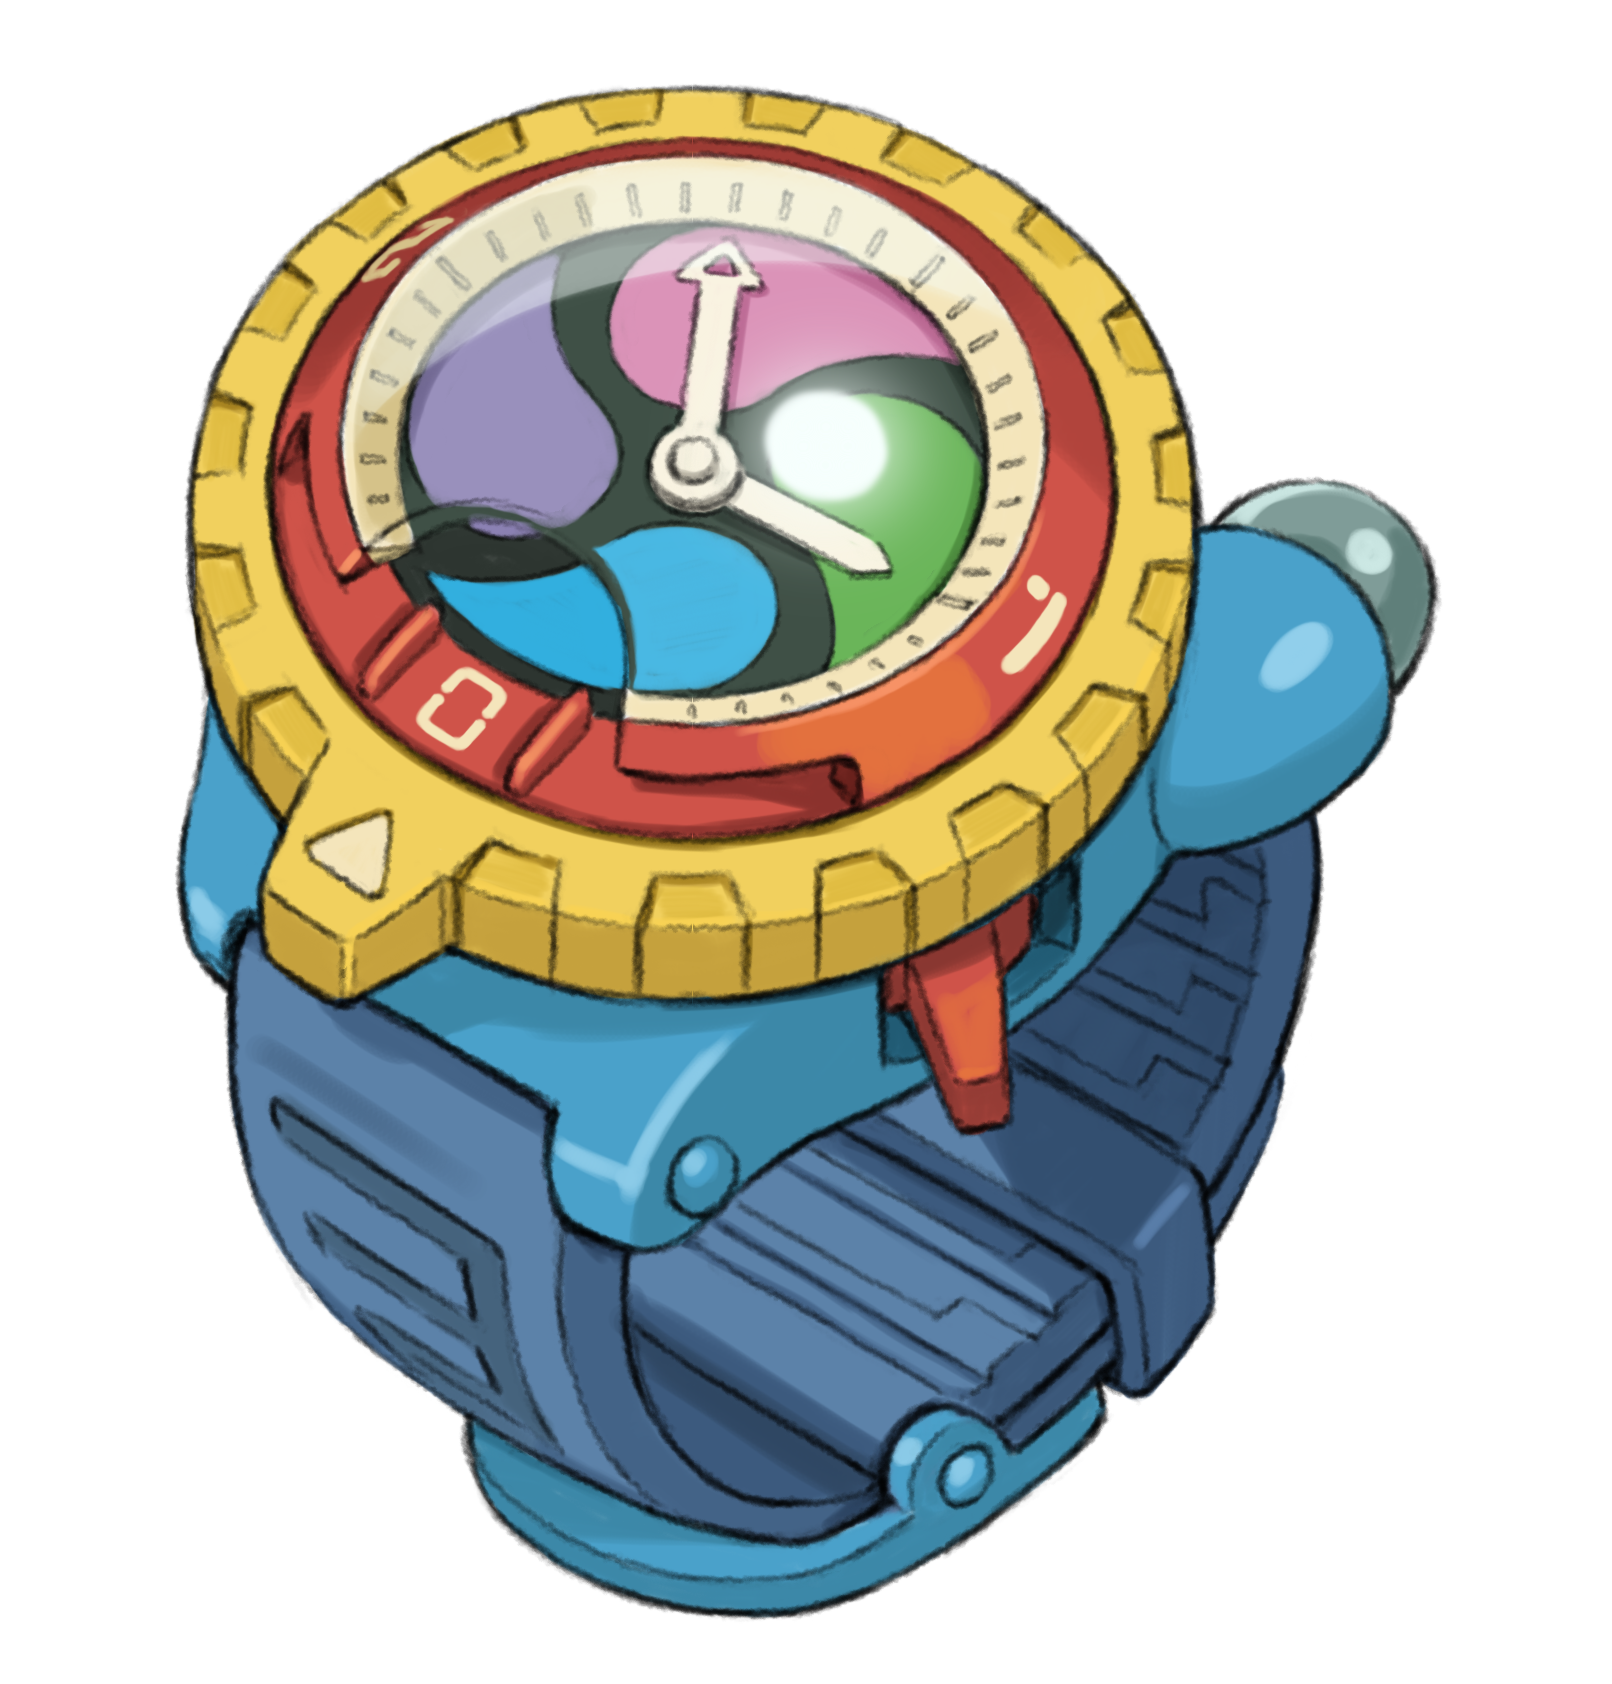 Yo-kai-Watch-2-Bony-Spirits-and-Fleshy-Souls_2016_09-01-16_021